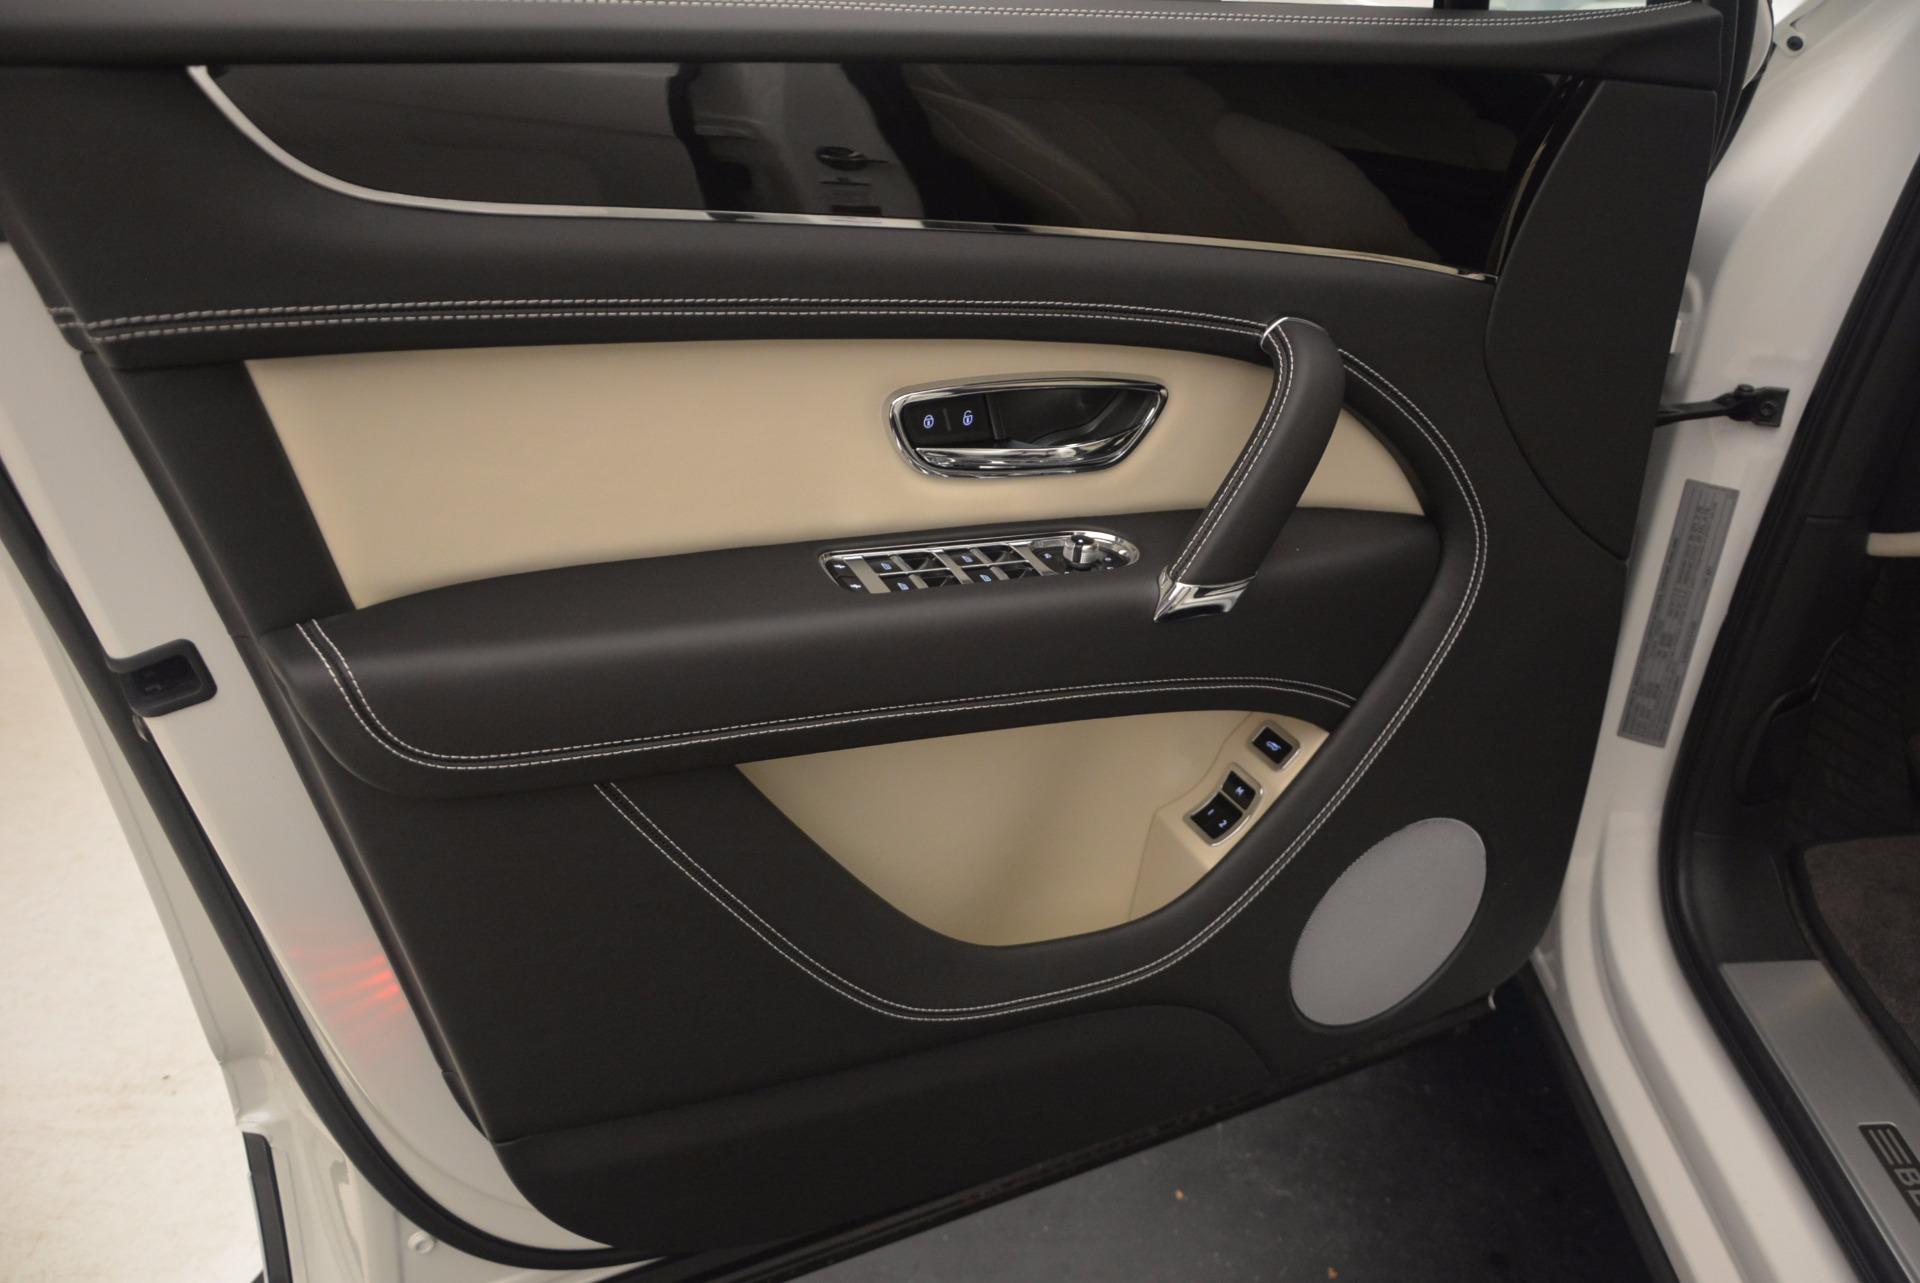 Used 2018 Bentley Bentayga Onyx For Sale In Greenwich, CT. Alfa Romeo of Greenwich, 7485 1549_p15